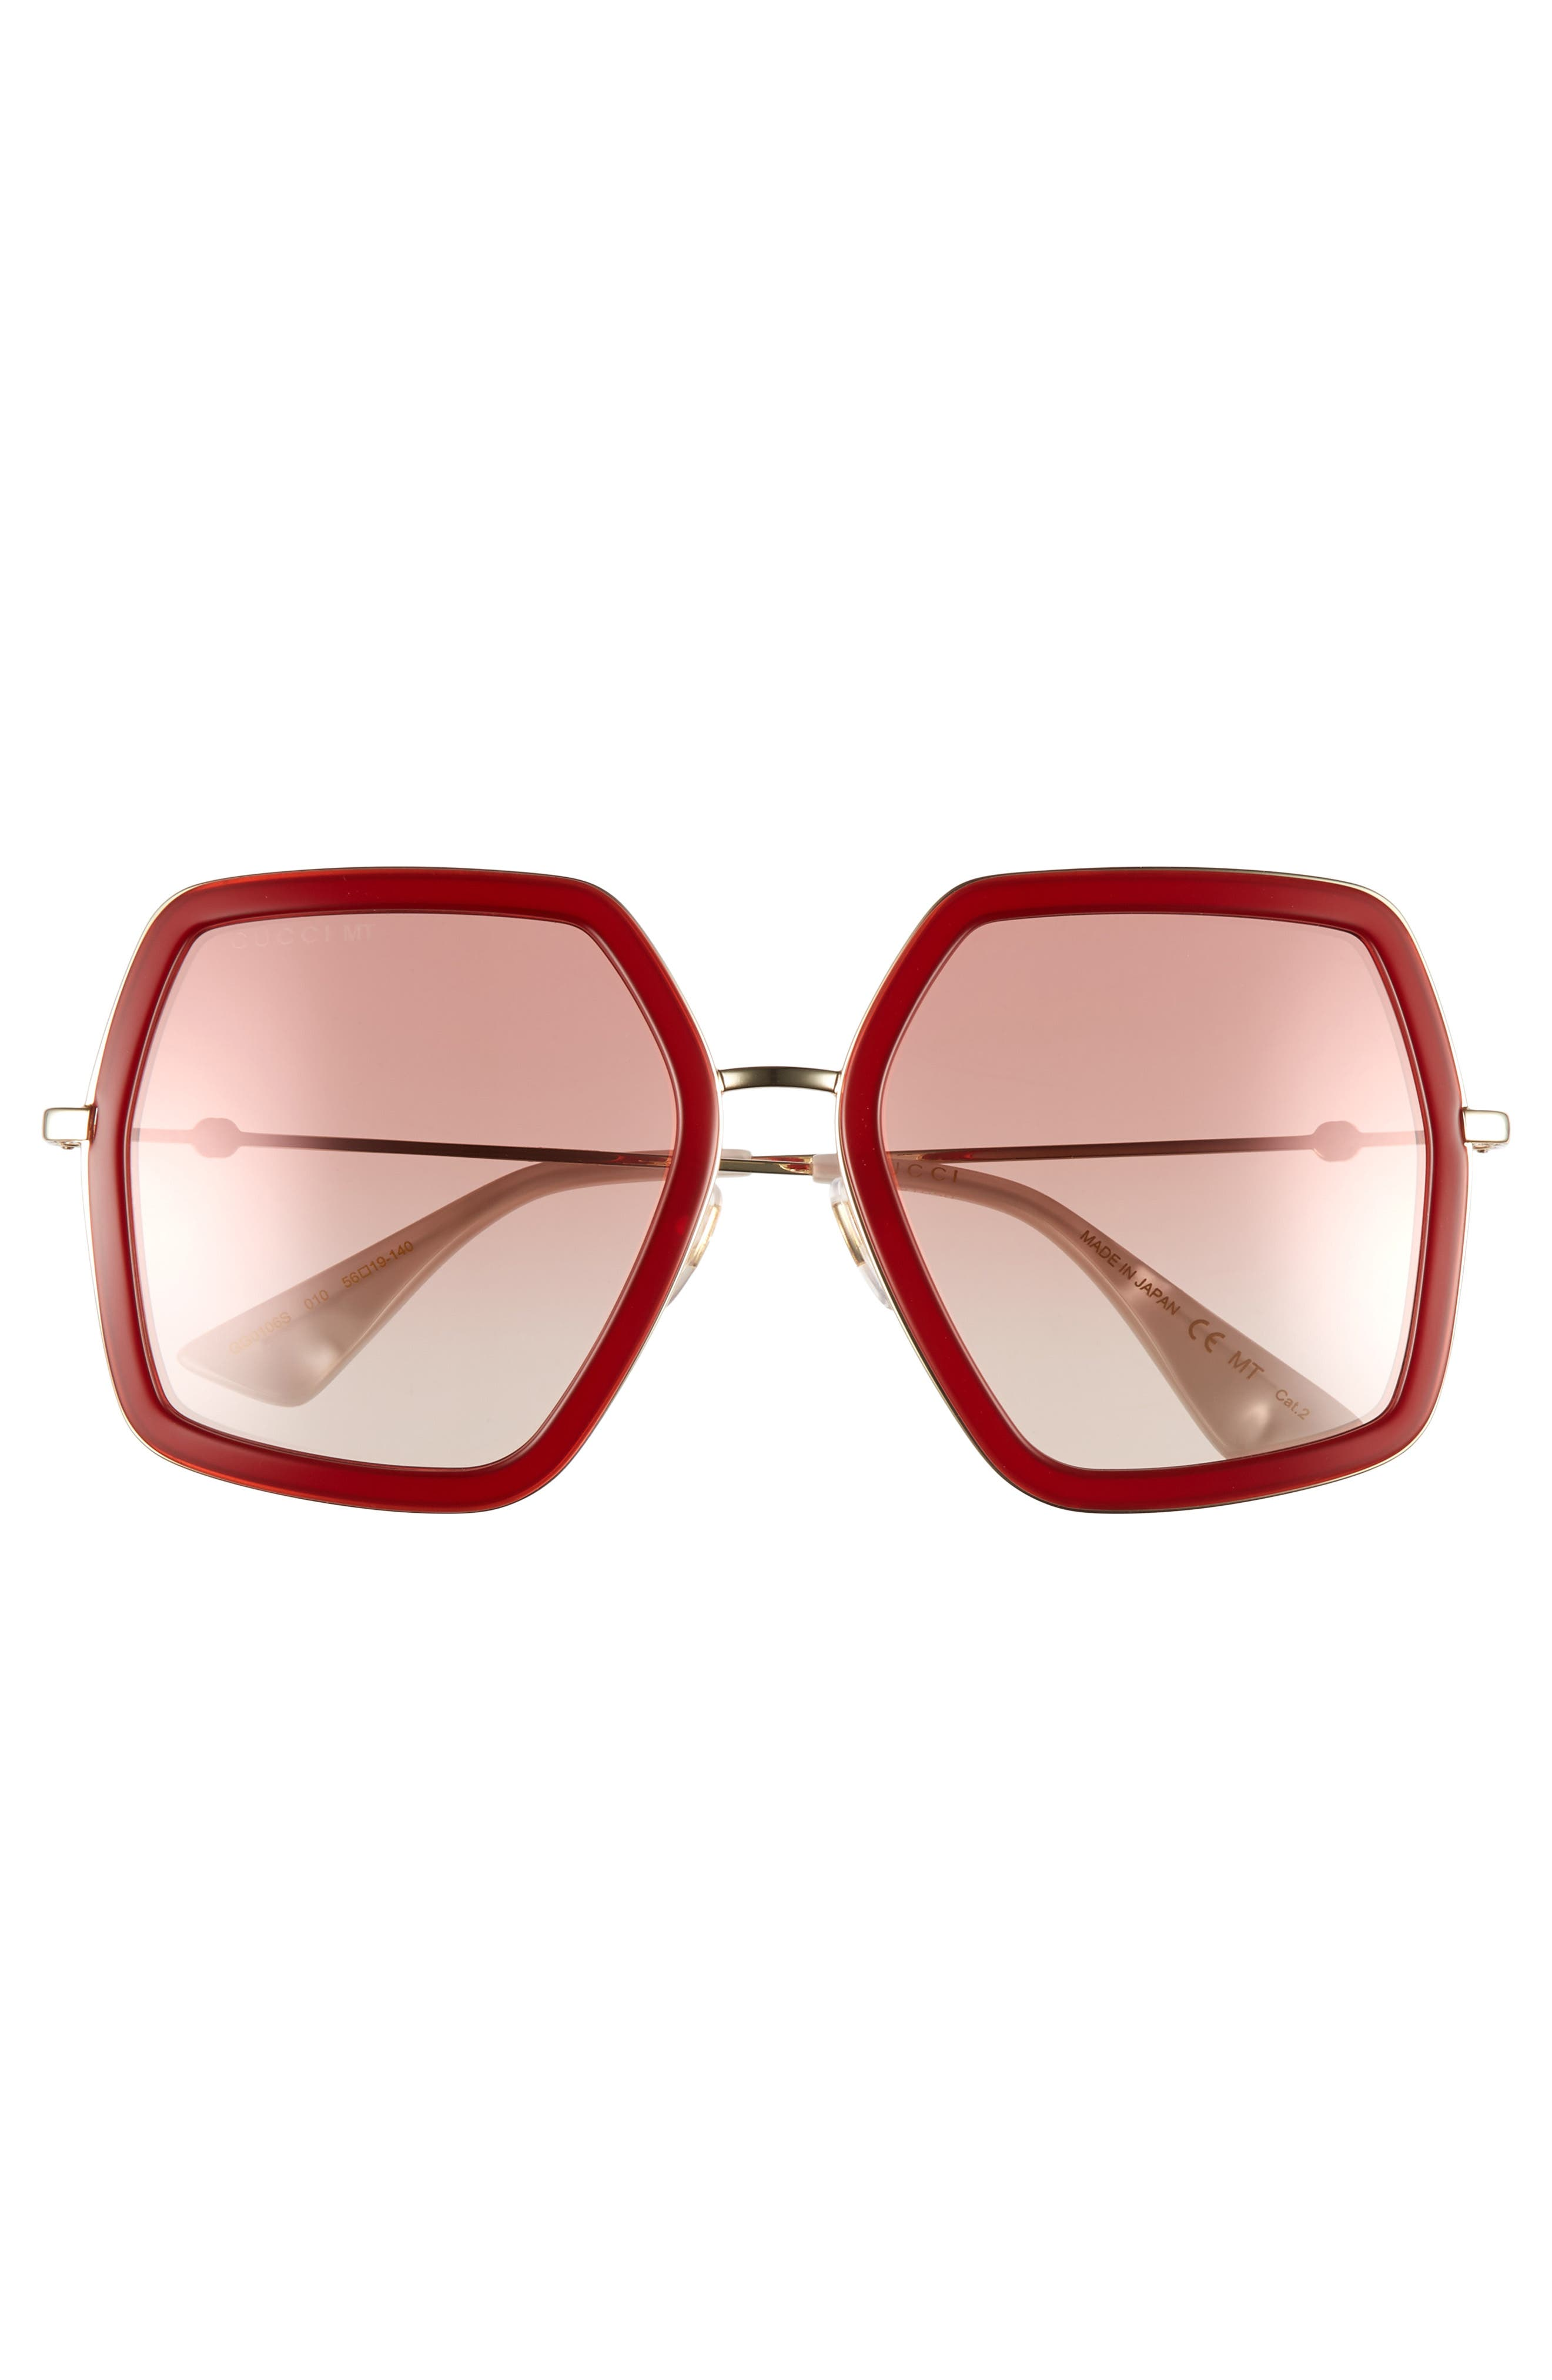 GUCCI, 56mm Sunglasses, Alternate thumbnail 3, color, SHINY ENDURA GLD/PK GRAD MIR